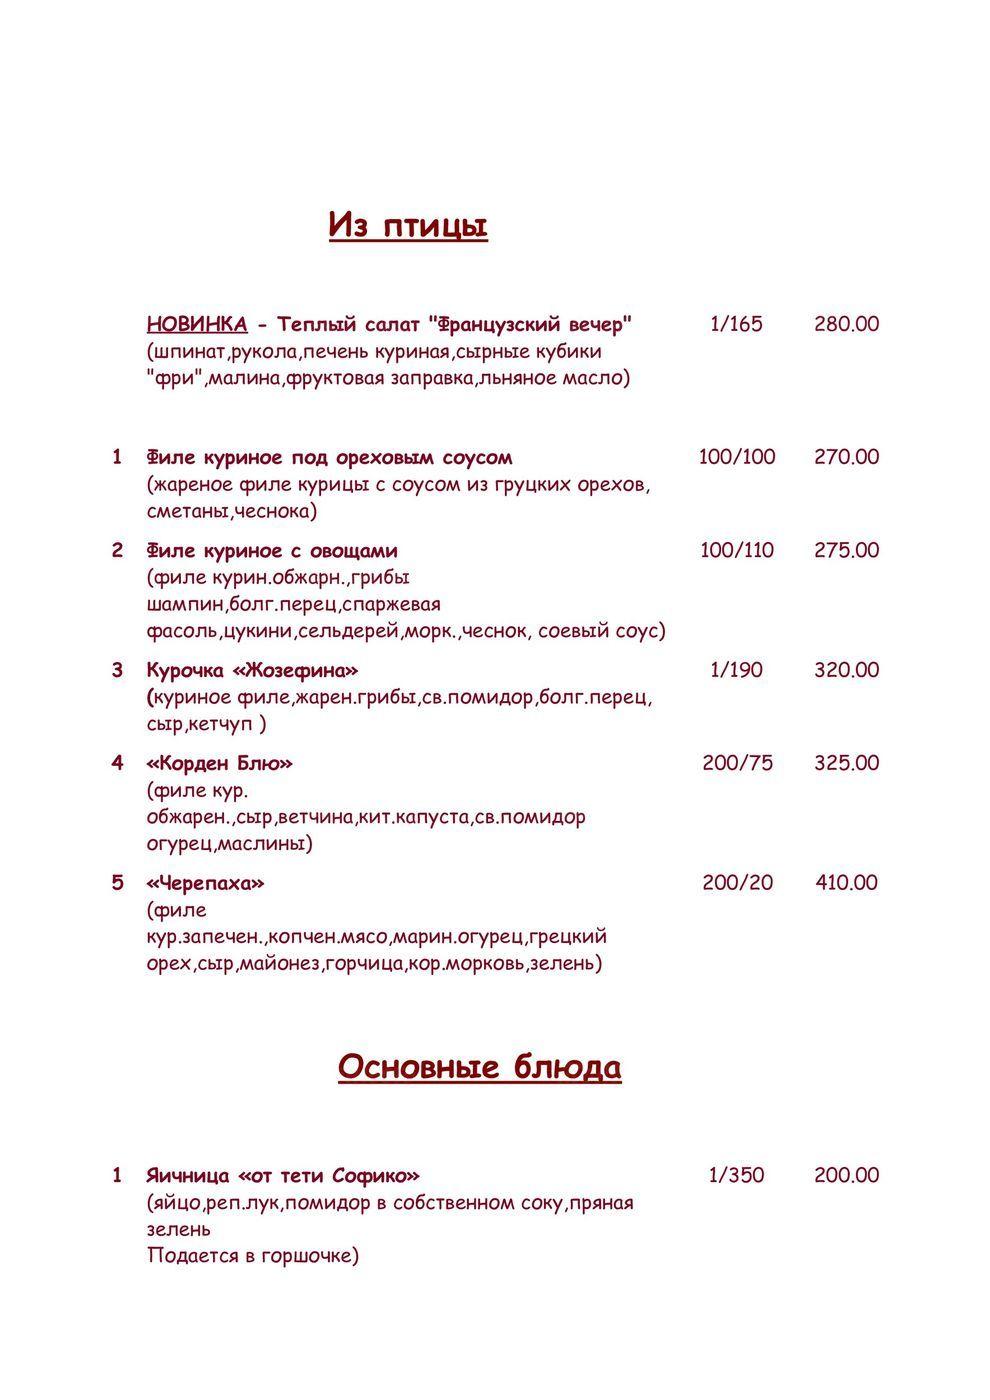 Меню кафе Мельба на улице Кирова фото 6